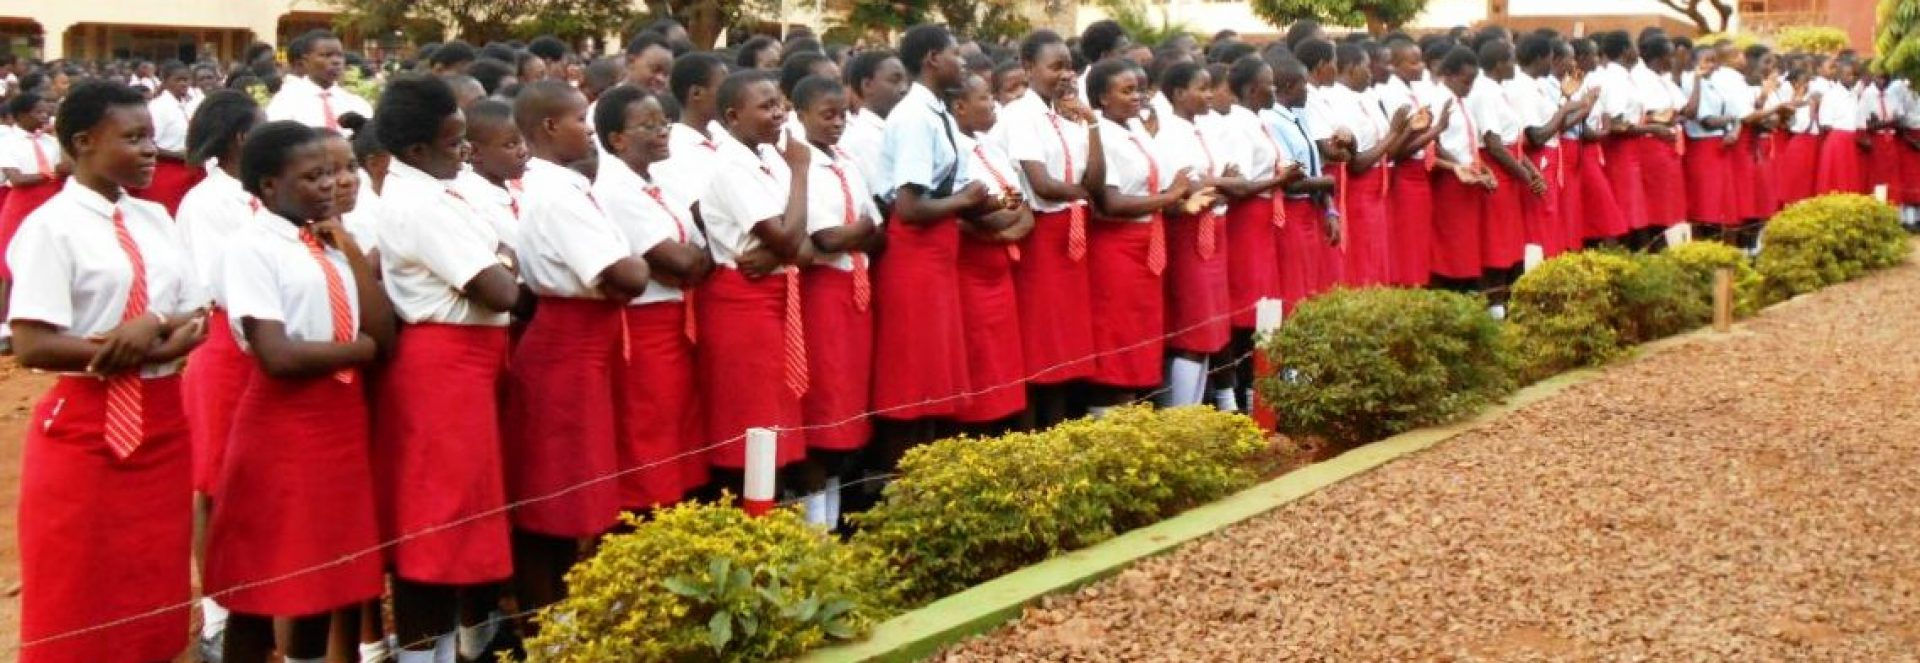 BISHOP OKOTH MBAGA GIRLS SECONDARY SCHOOL